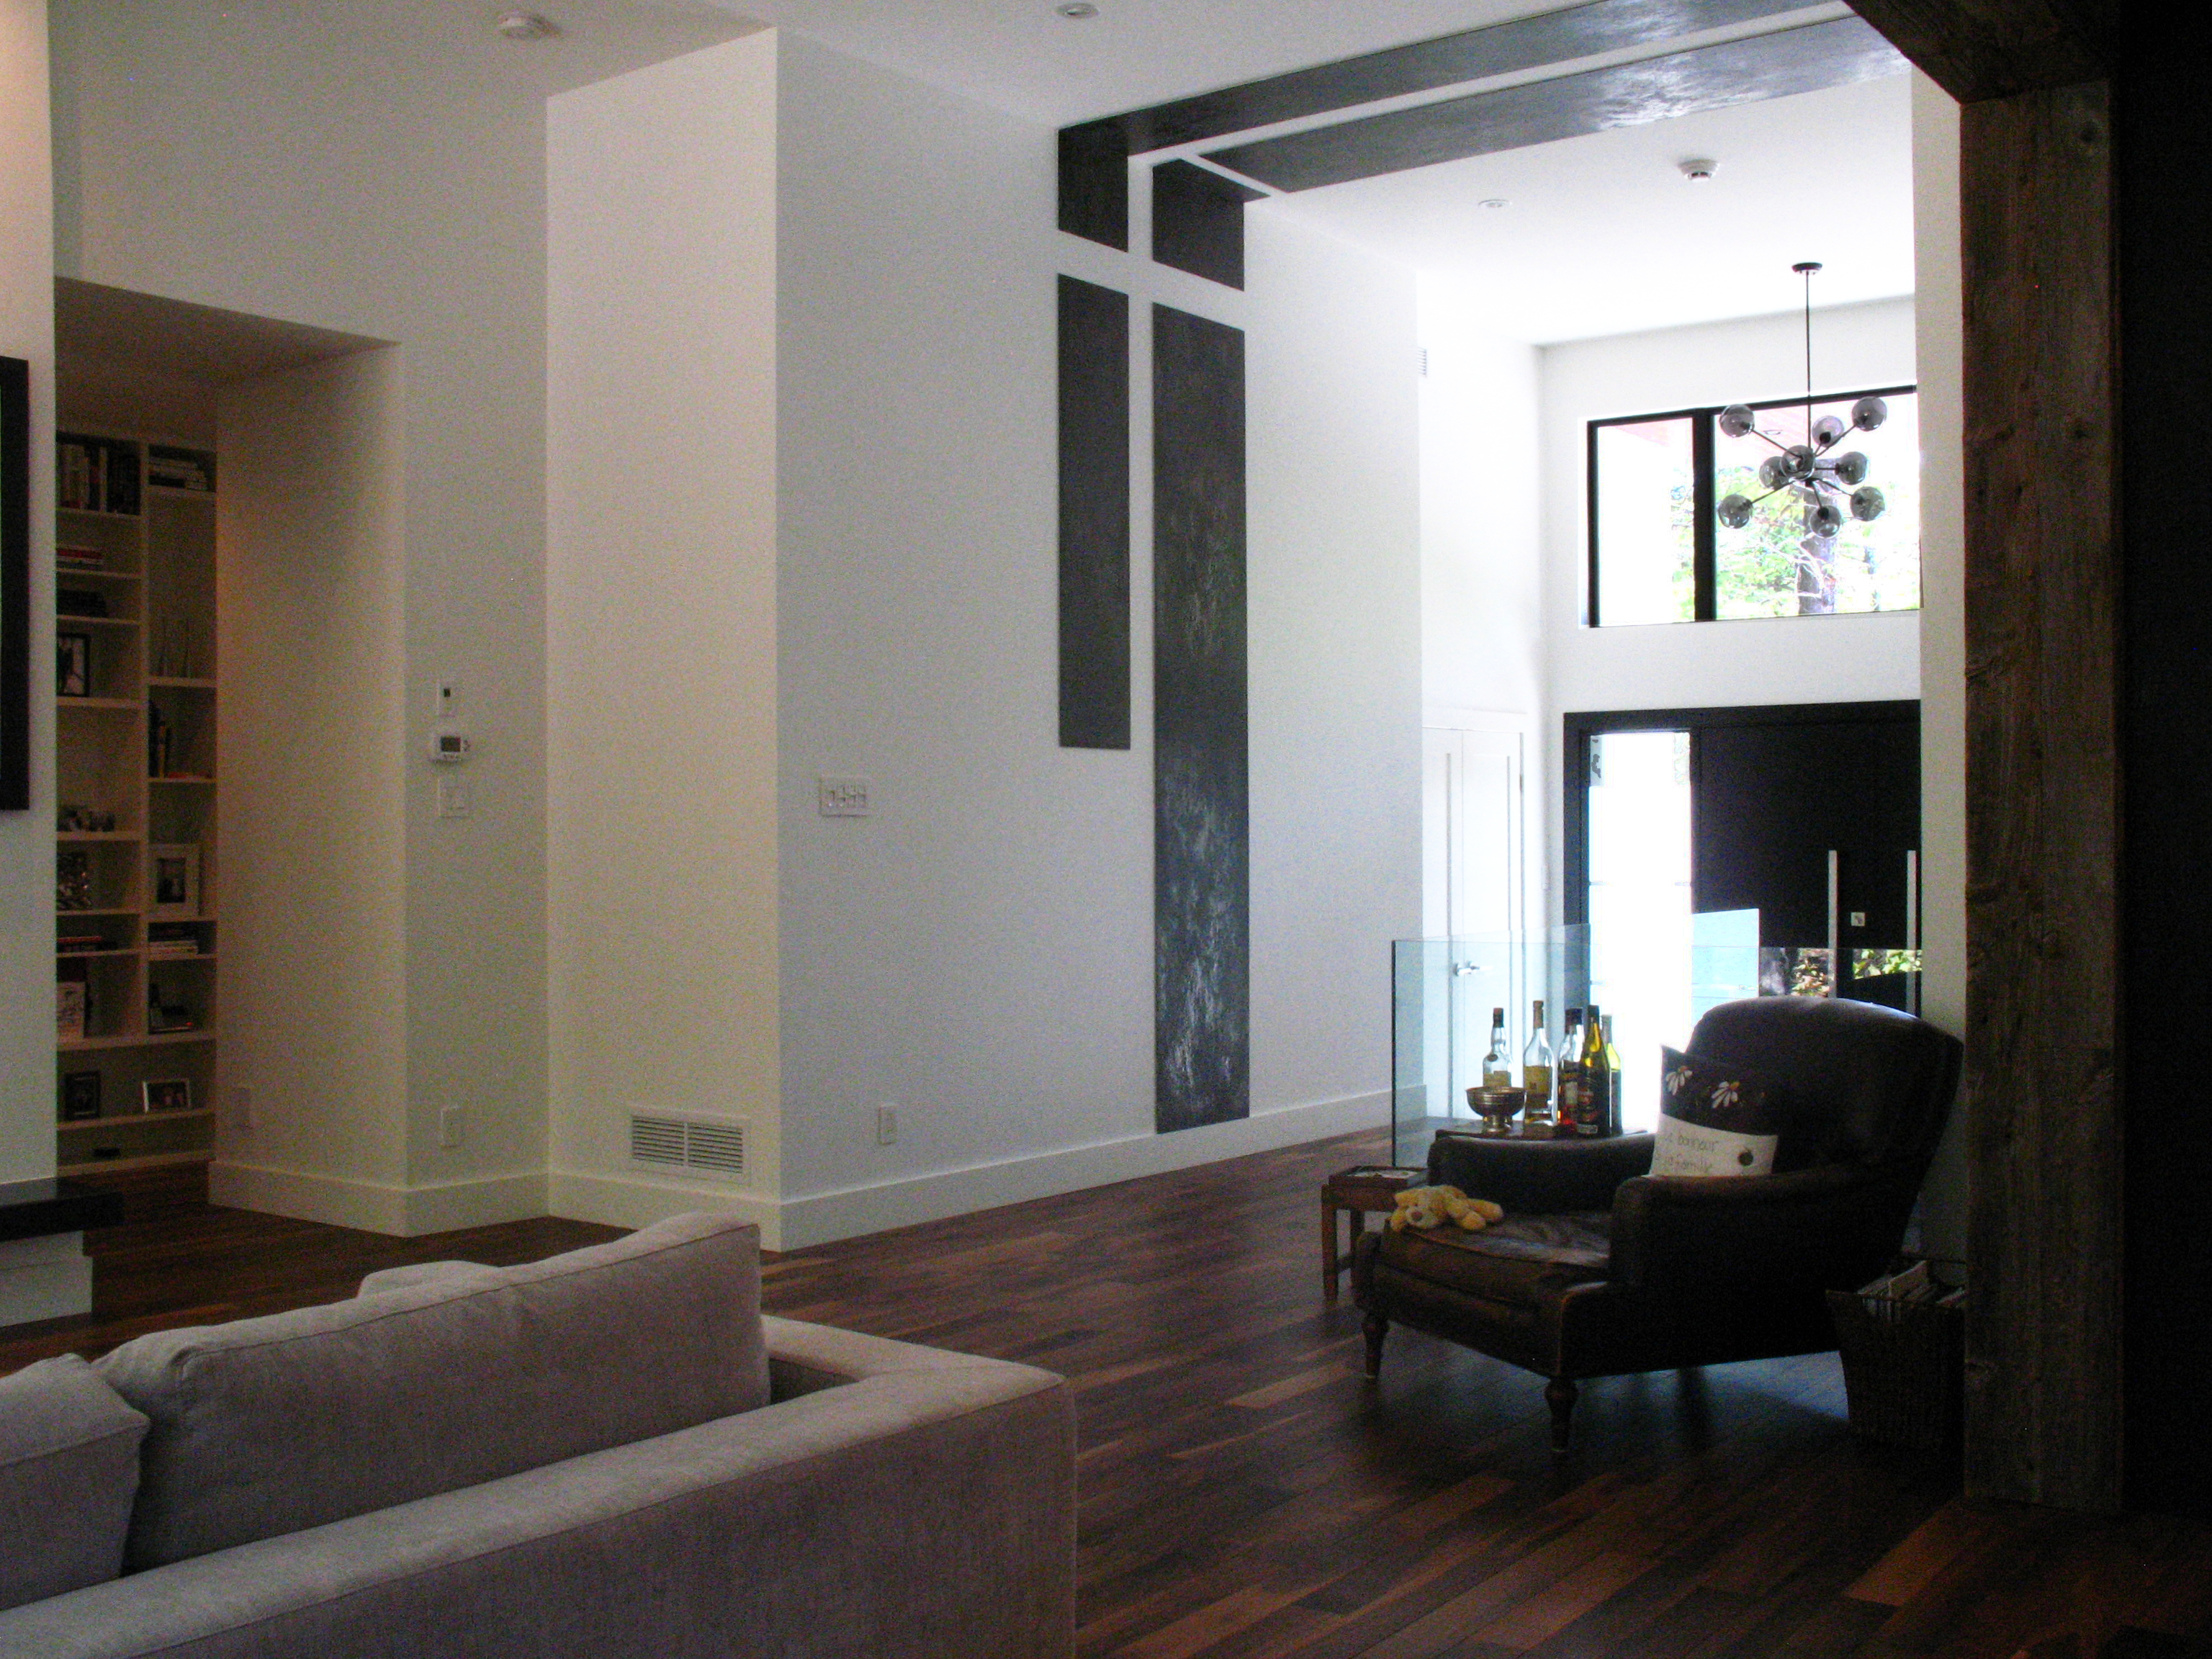 laminam mur plafond mcd3 design. Black Bedroom Furniture Sets. Home Design Ideas